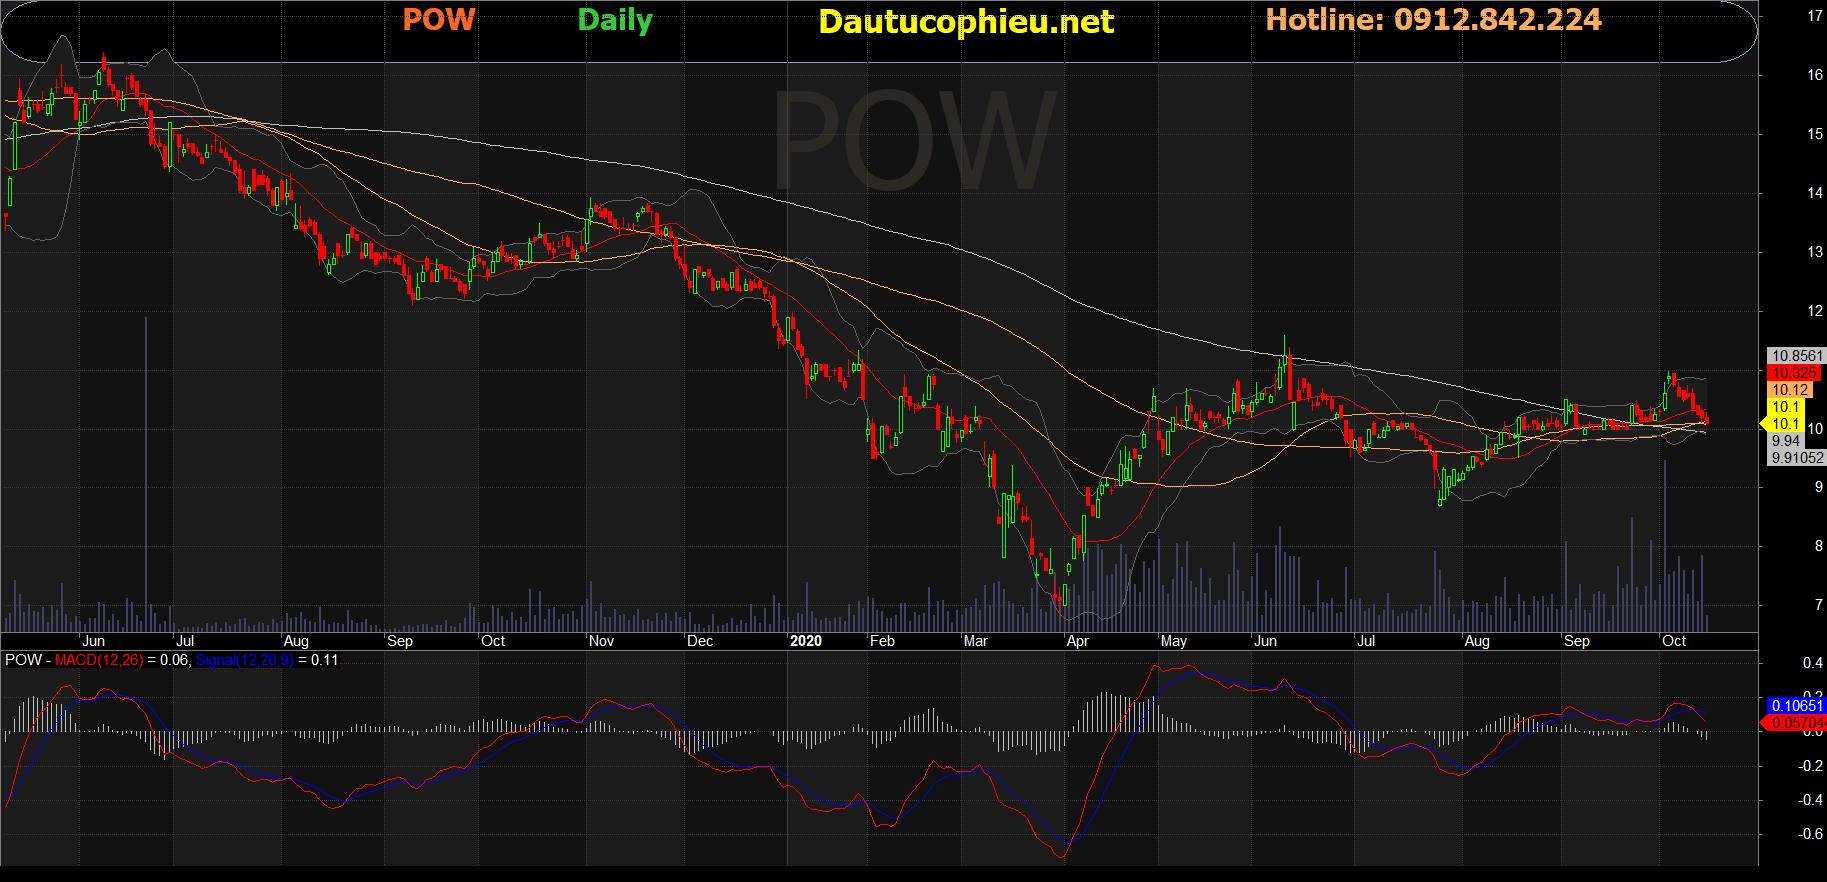 Cổ phiếu POW